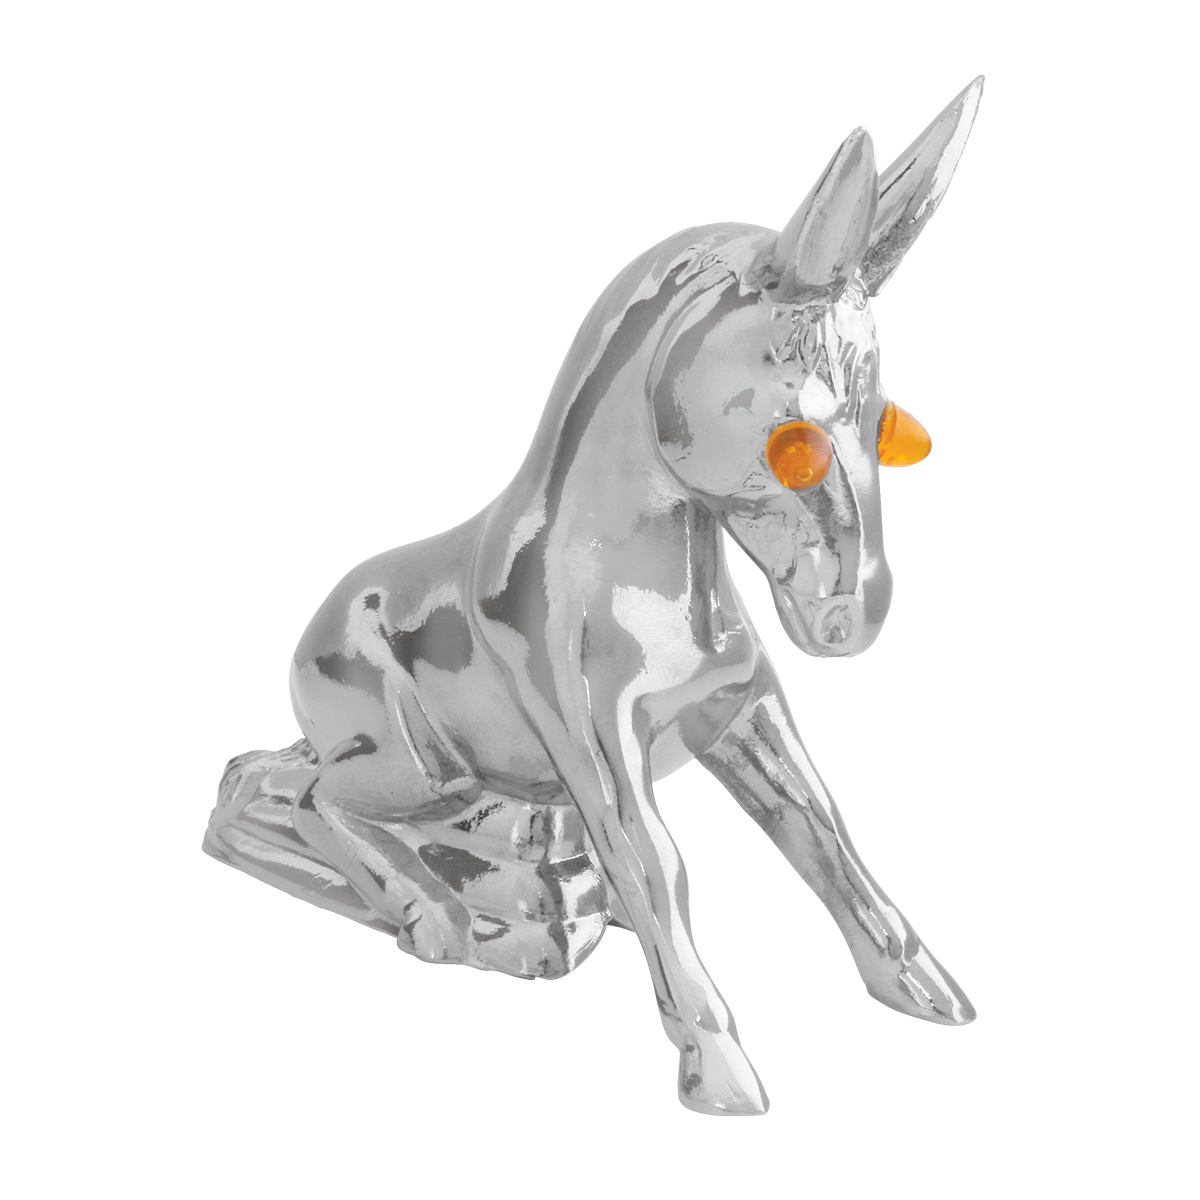 Chrome Die Cast Novelty Donkey w/Illuminated Eyes – Eyes Unlit